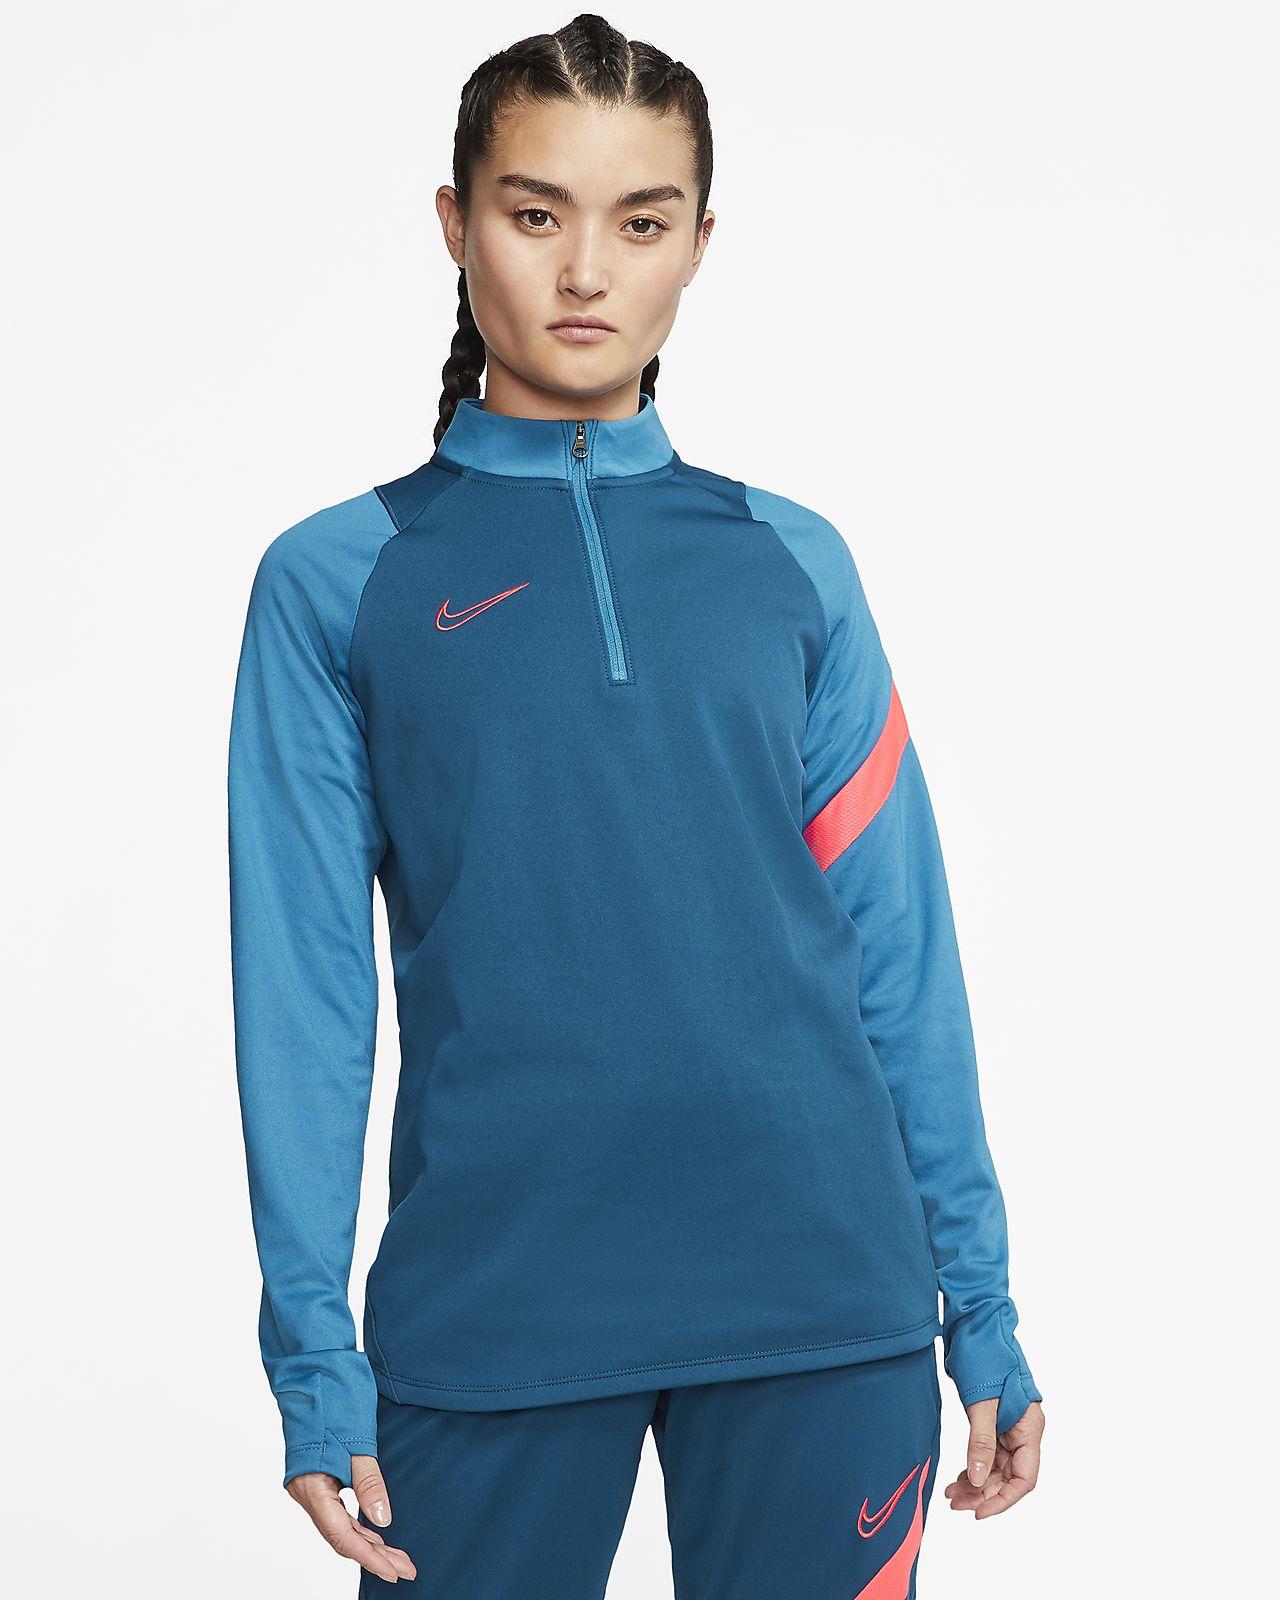 Nike Dri-FIT Academy Pro Voetbaltrainingstop voor dames